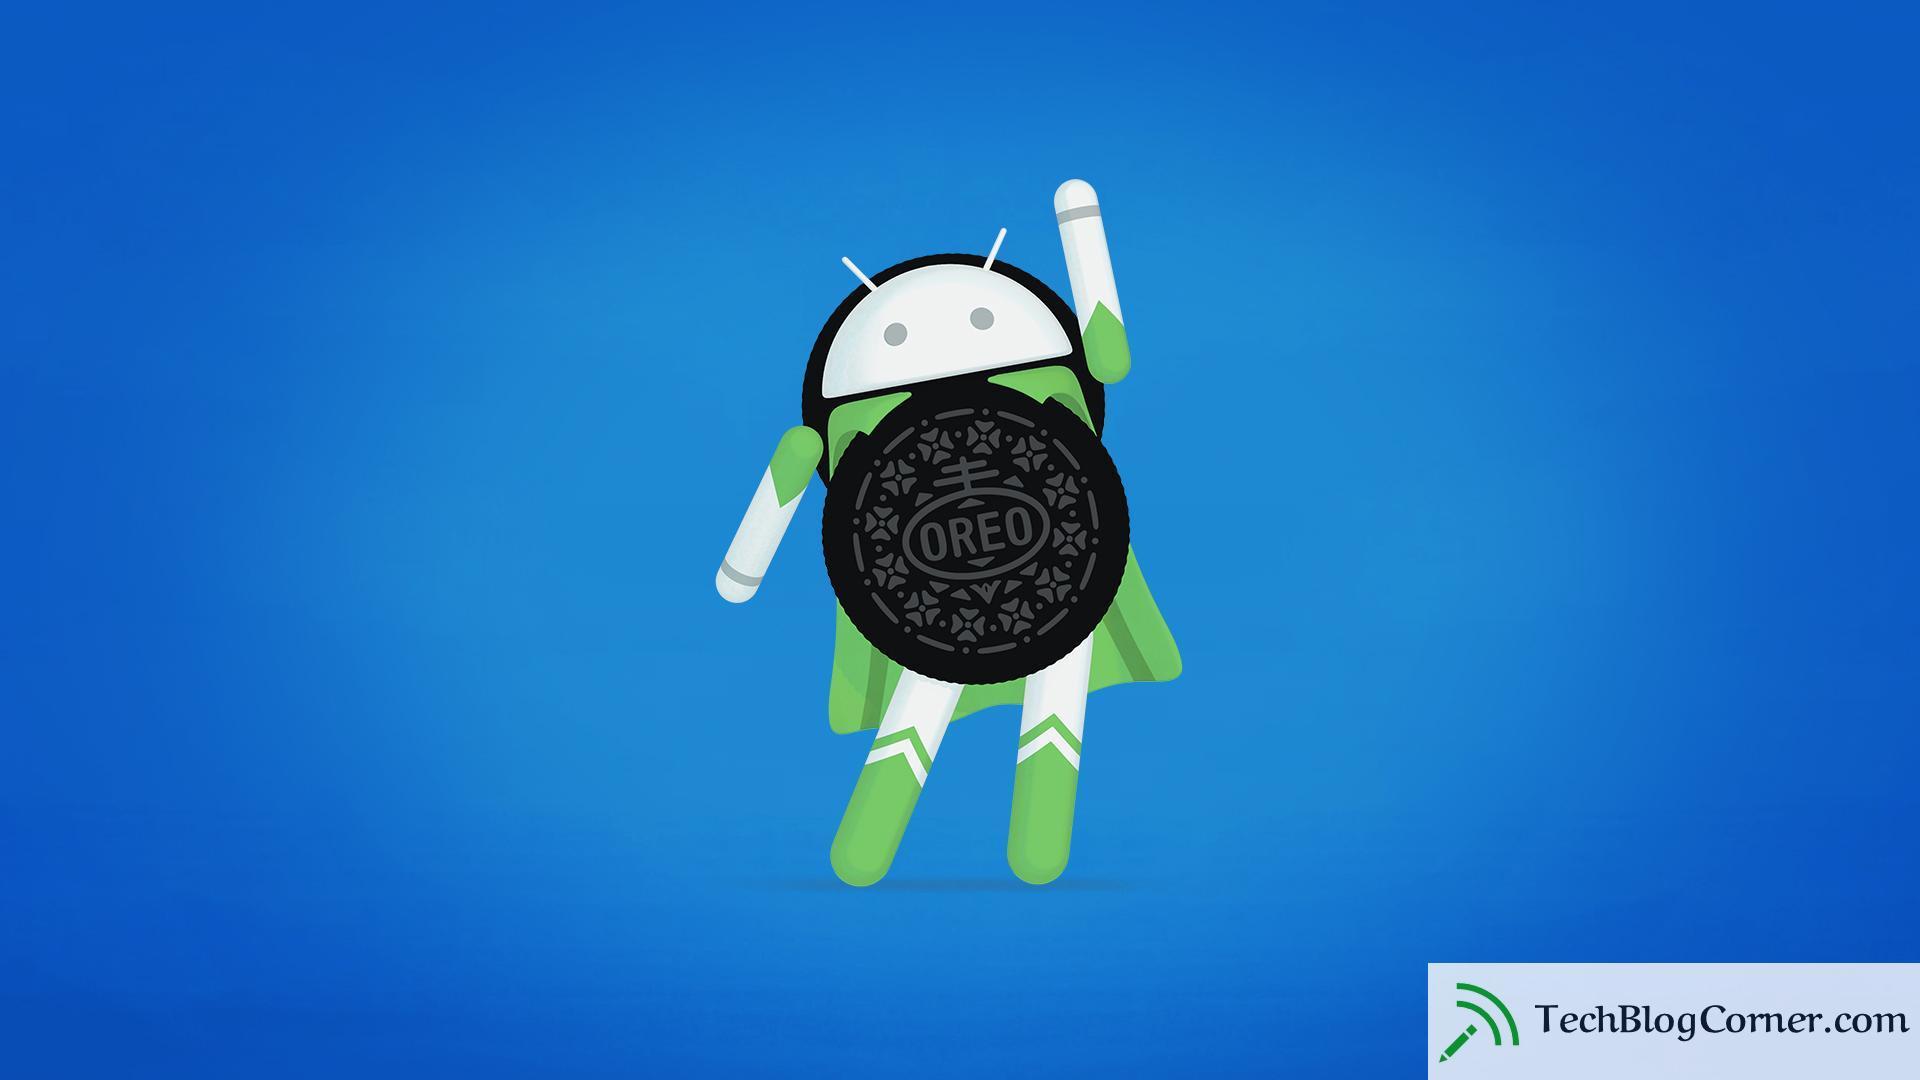 AndroidOreoLockup-techblogcorner